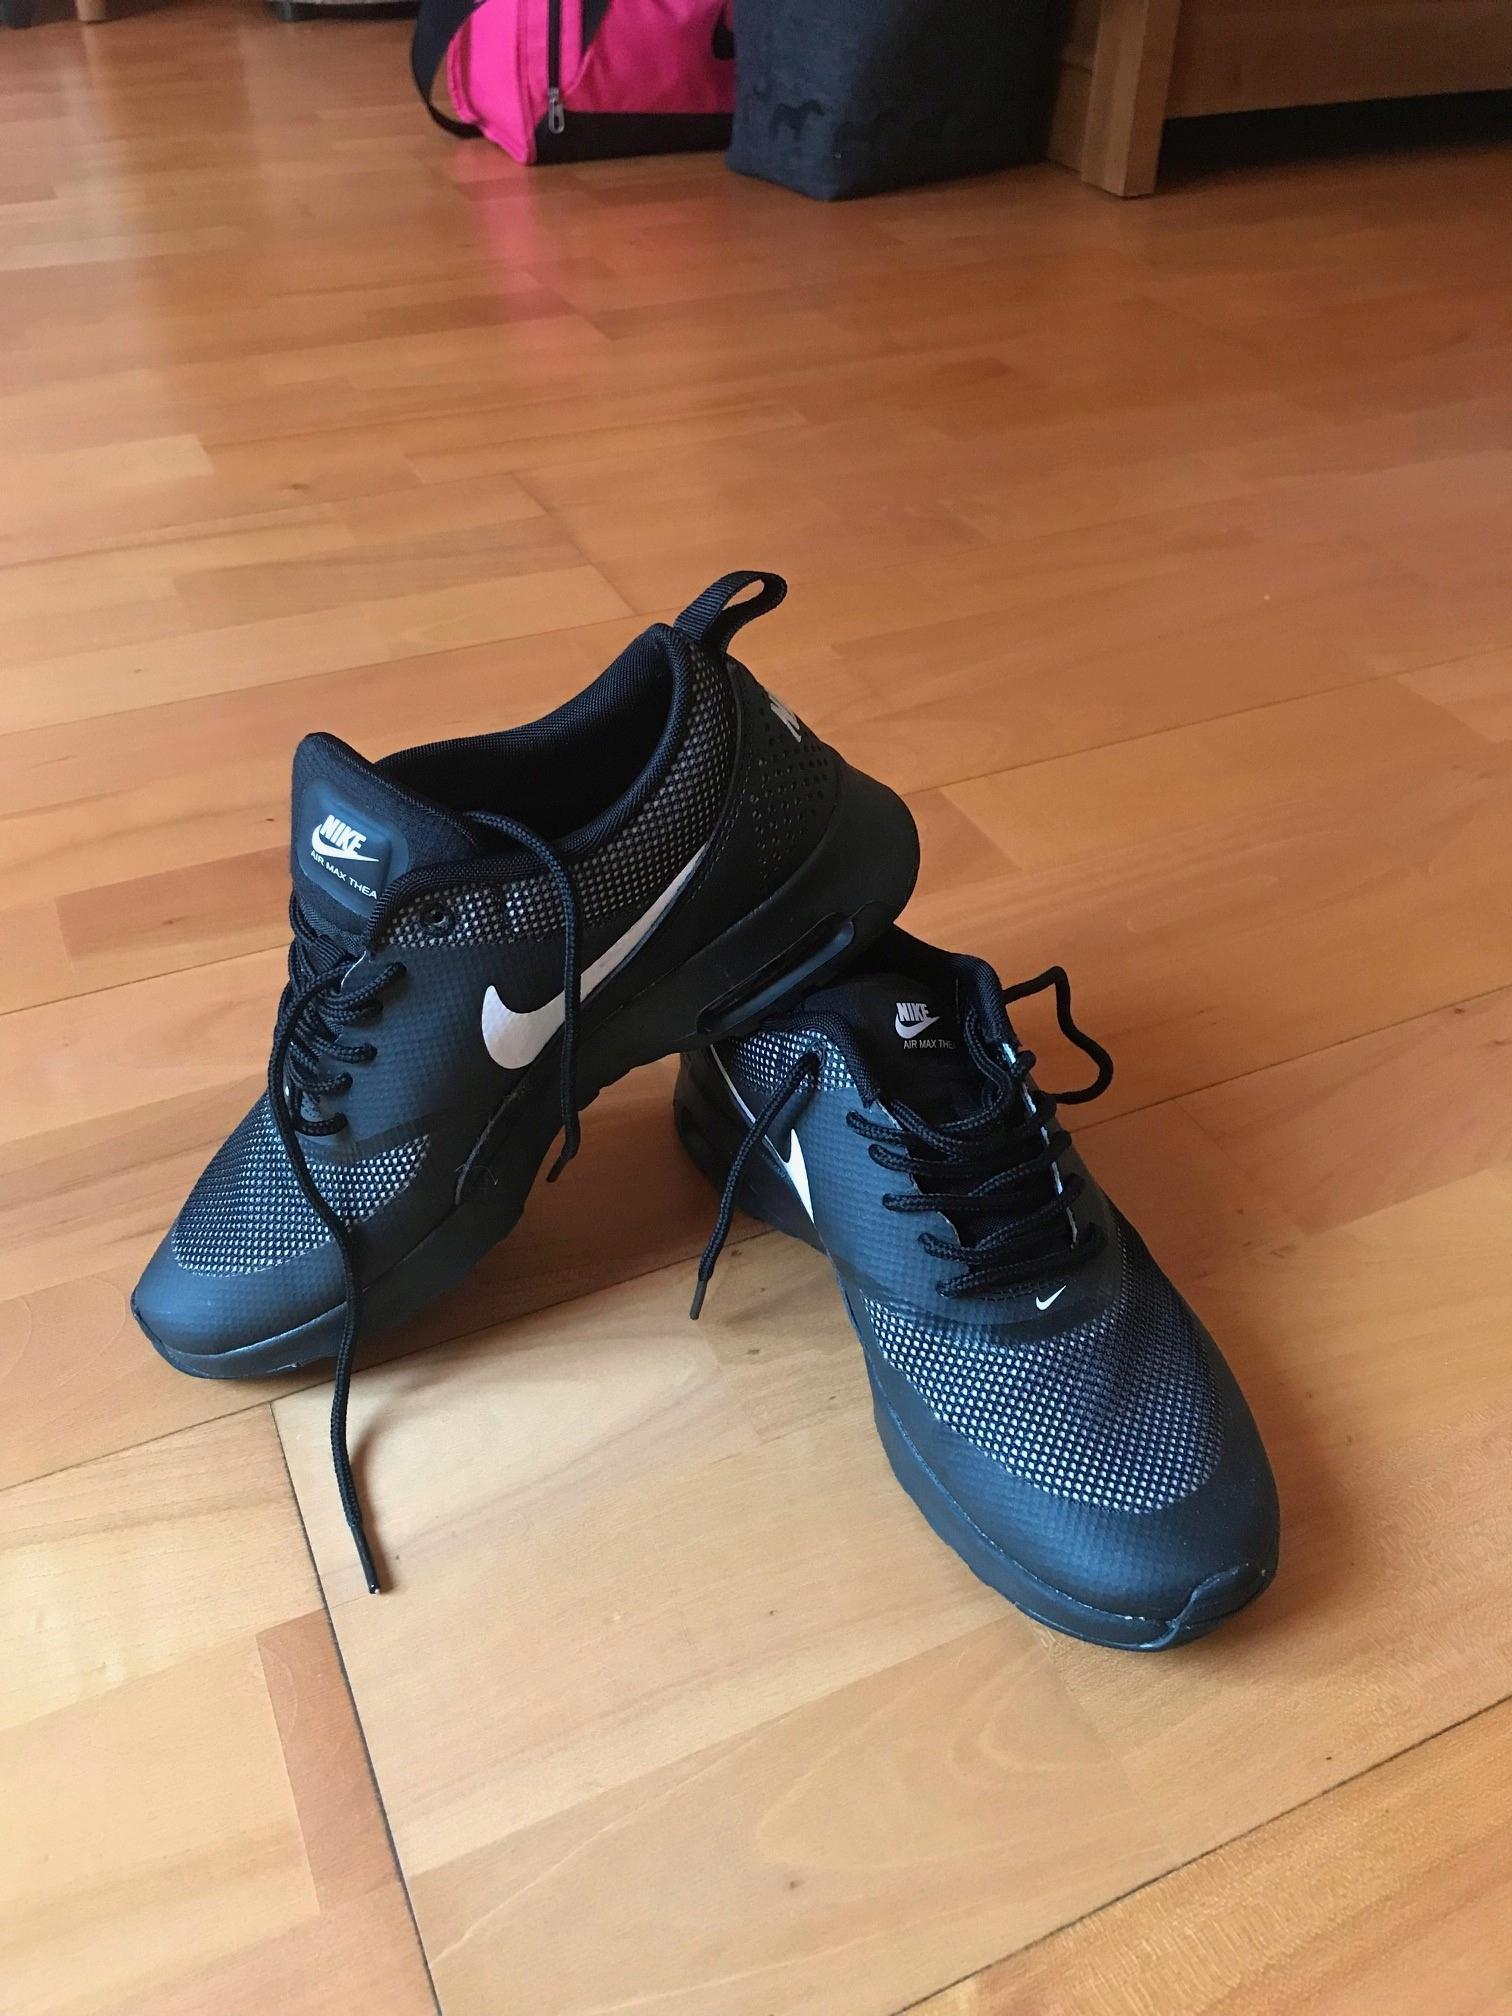 Nike air max thea czarne 37,5 7367733082 oficjalne